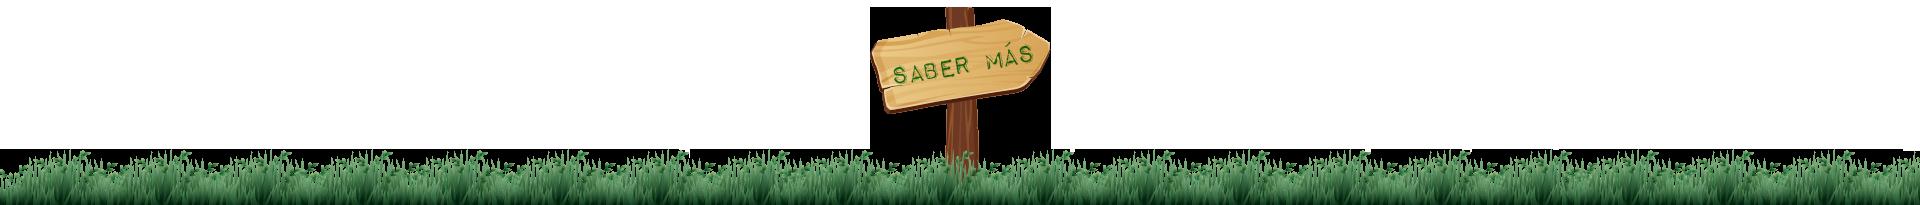 SABER-MAS-FULL